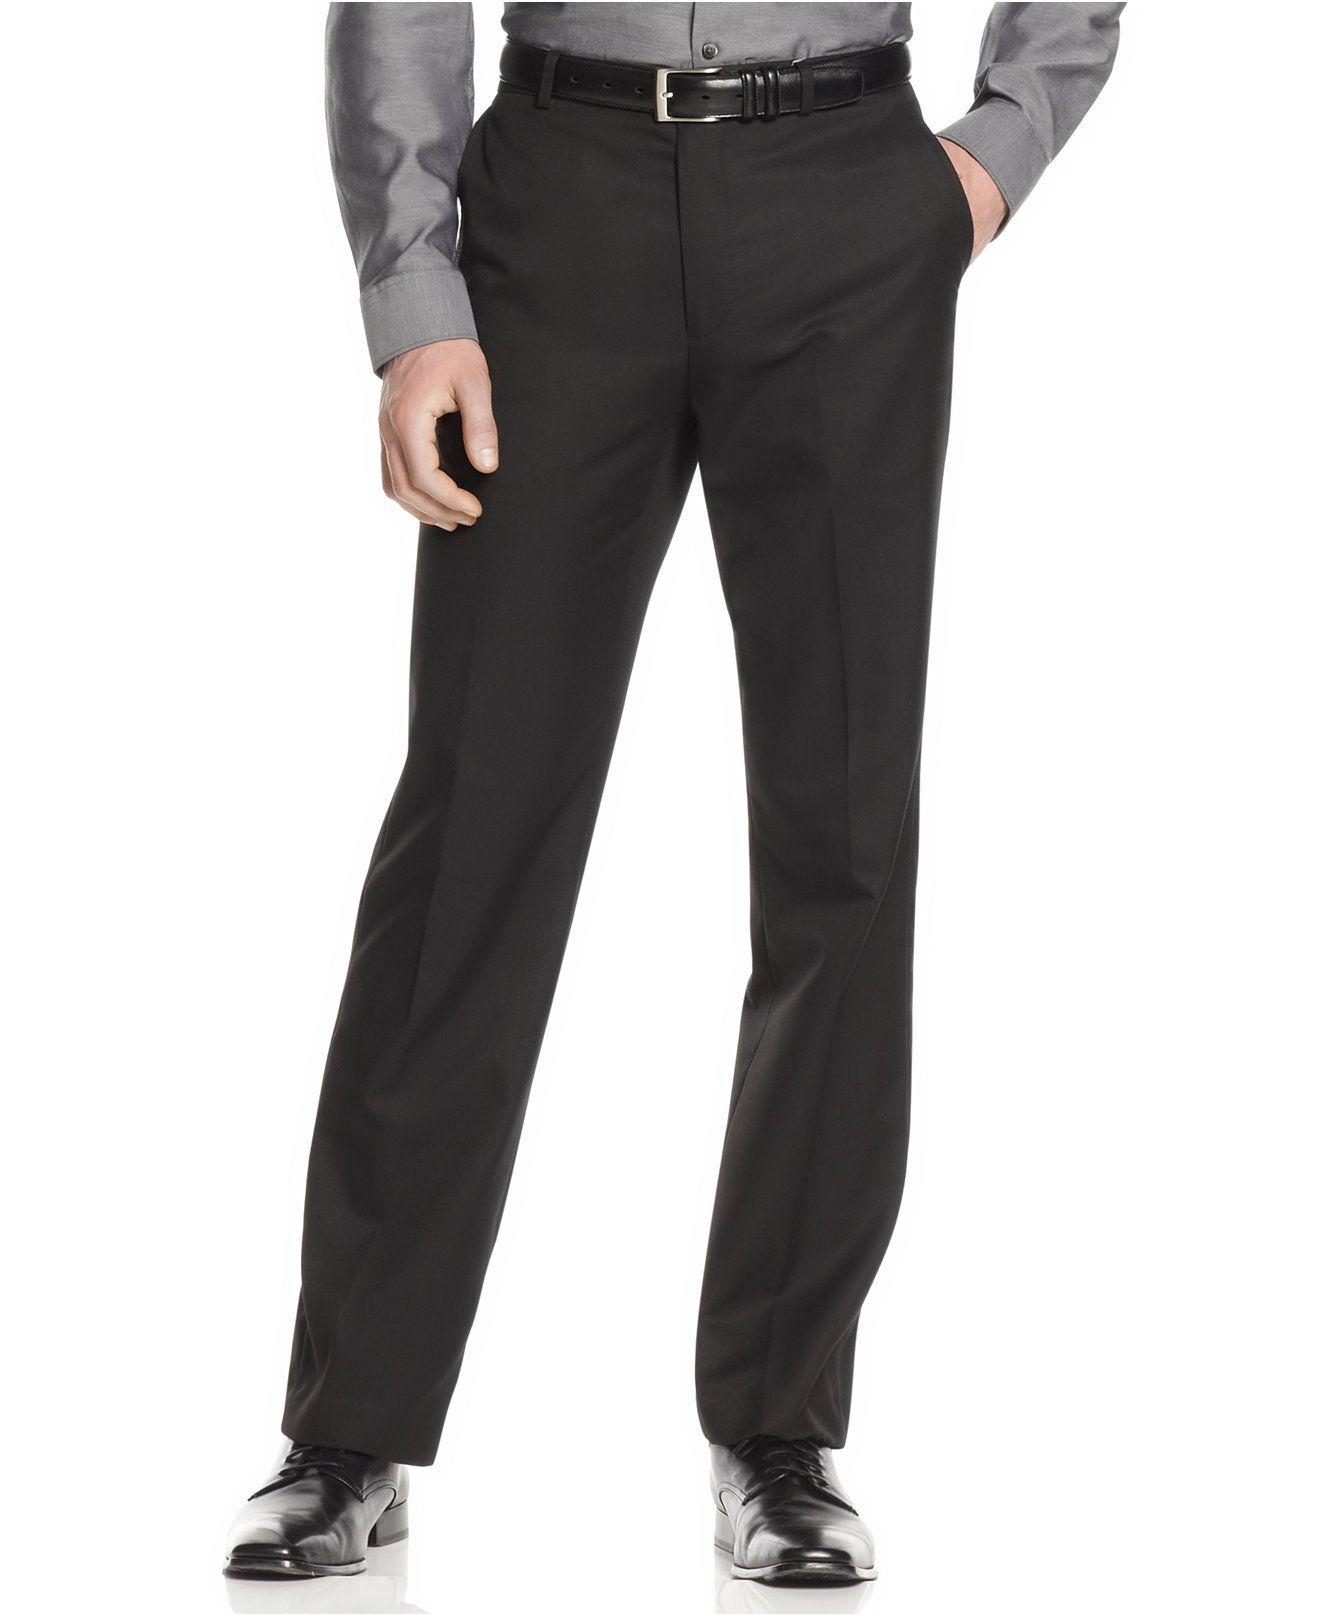 Calvin Klein Pants, Core Slim Fit Dress Pants - Pants ...